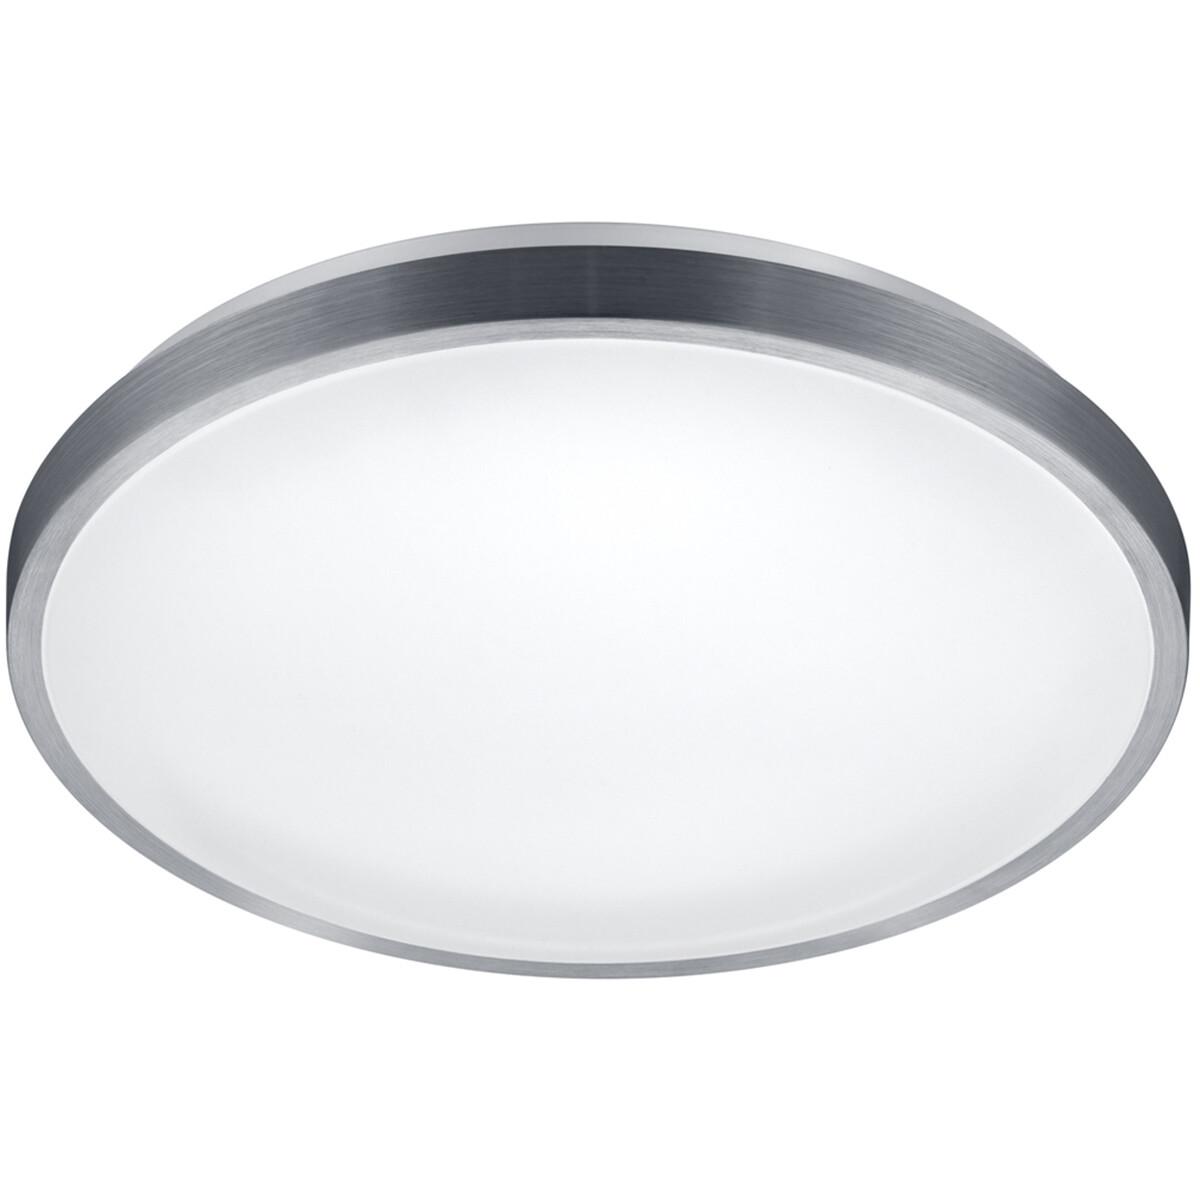 LED Plafondlamp - Plafondverlichting - Trion Izonu - 20W - Warm Wit 3000K - Rond - Mat Grijs - Alumi